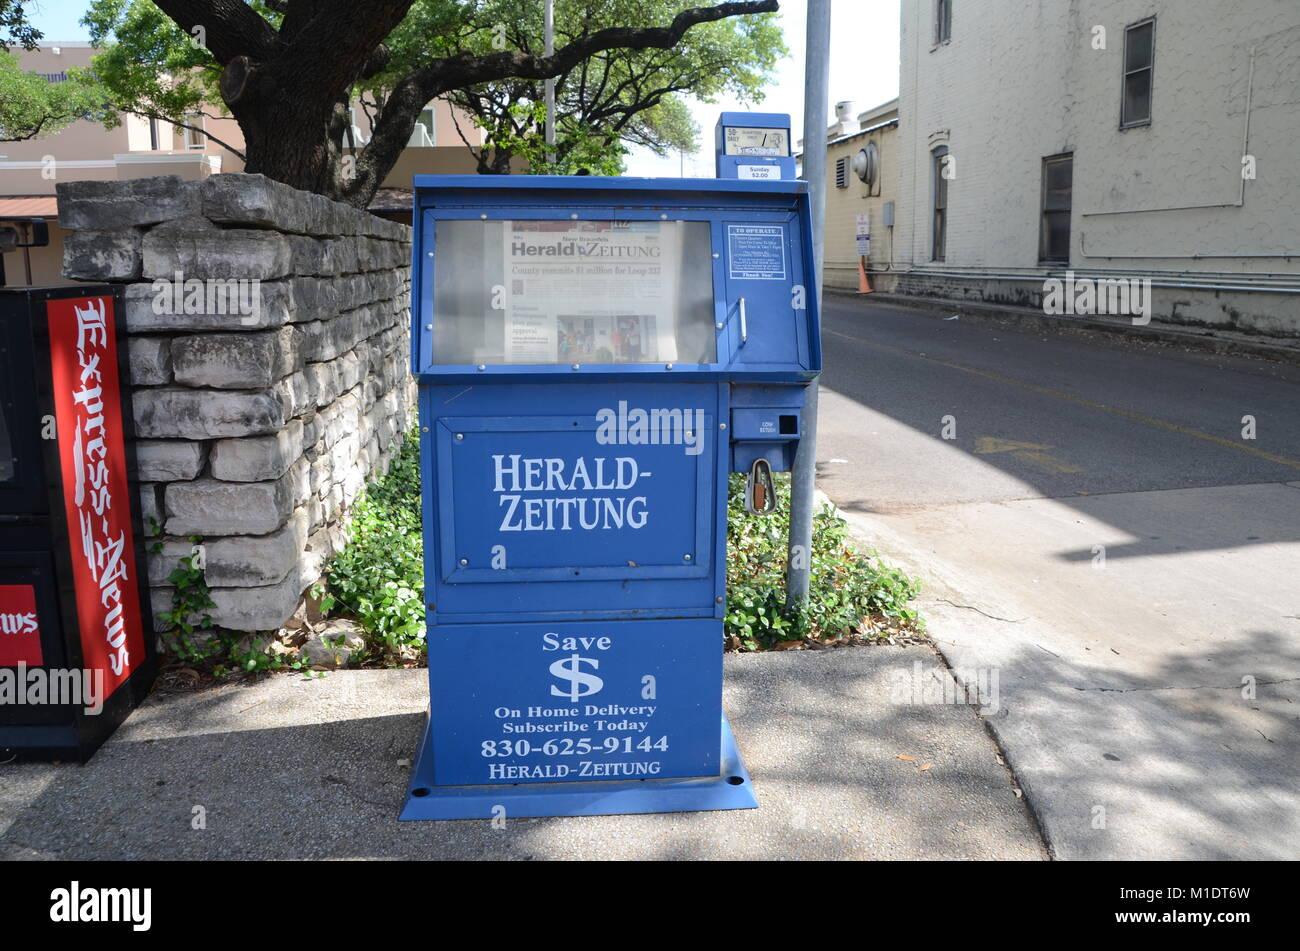 Herald Newspaper Stock Photos & Herald Newspaper Stock